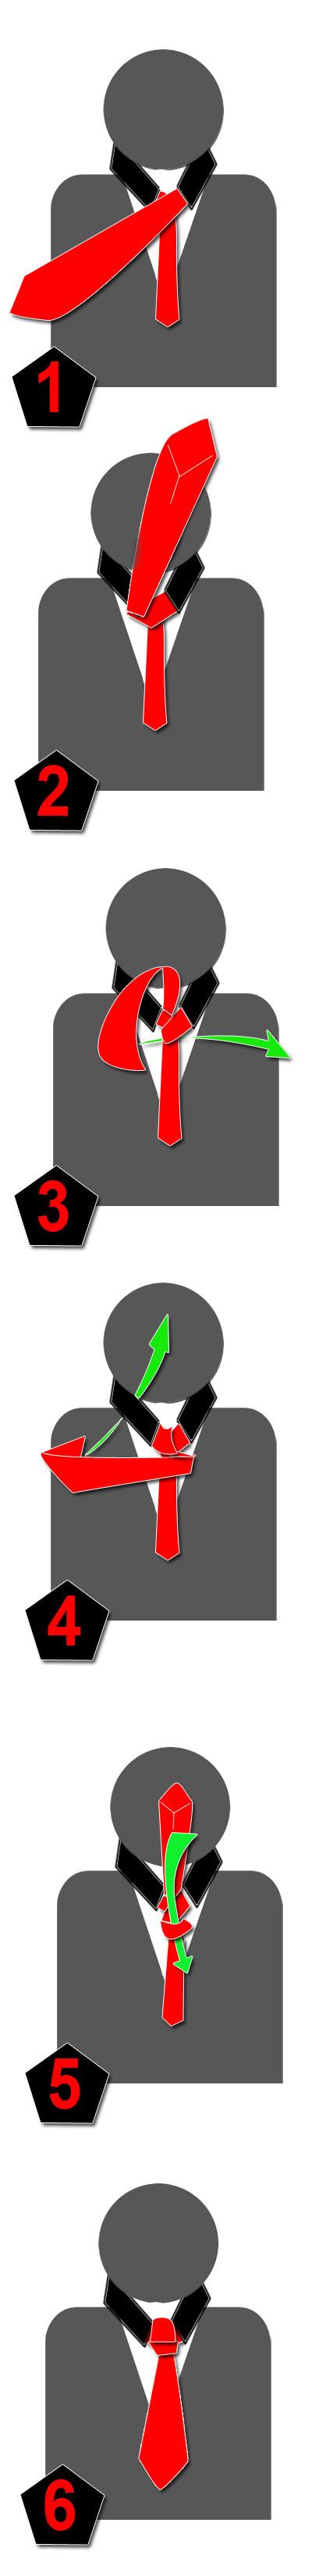 einfacher-windsor-knoten